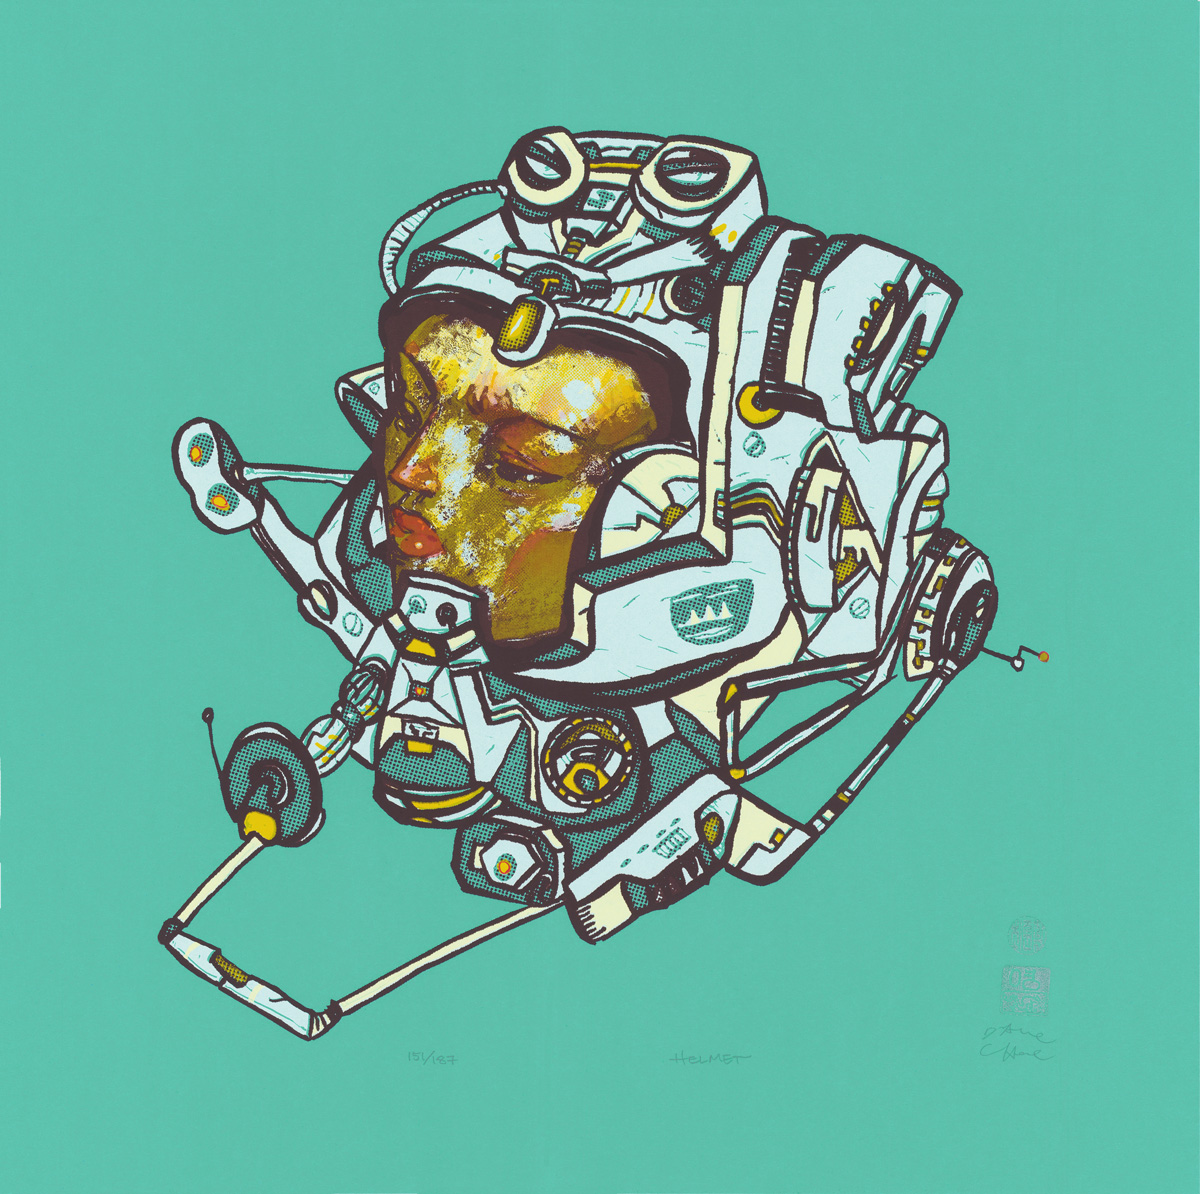 David-Choe-Helmet-01